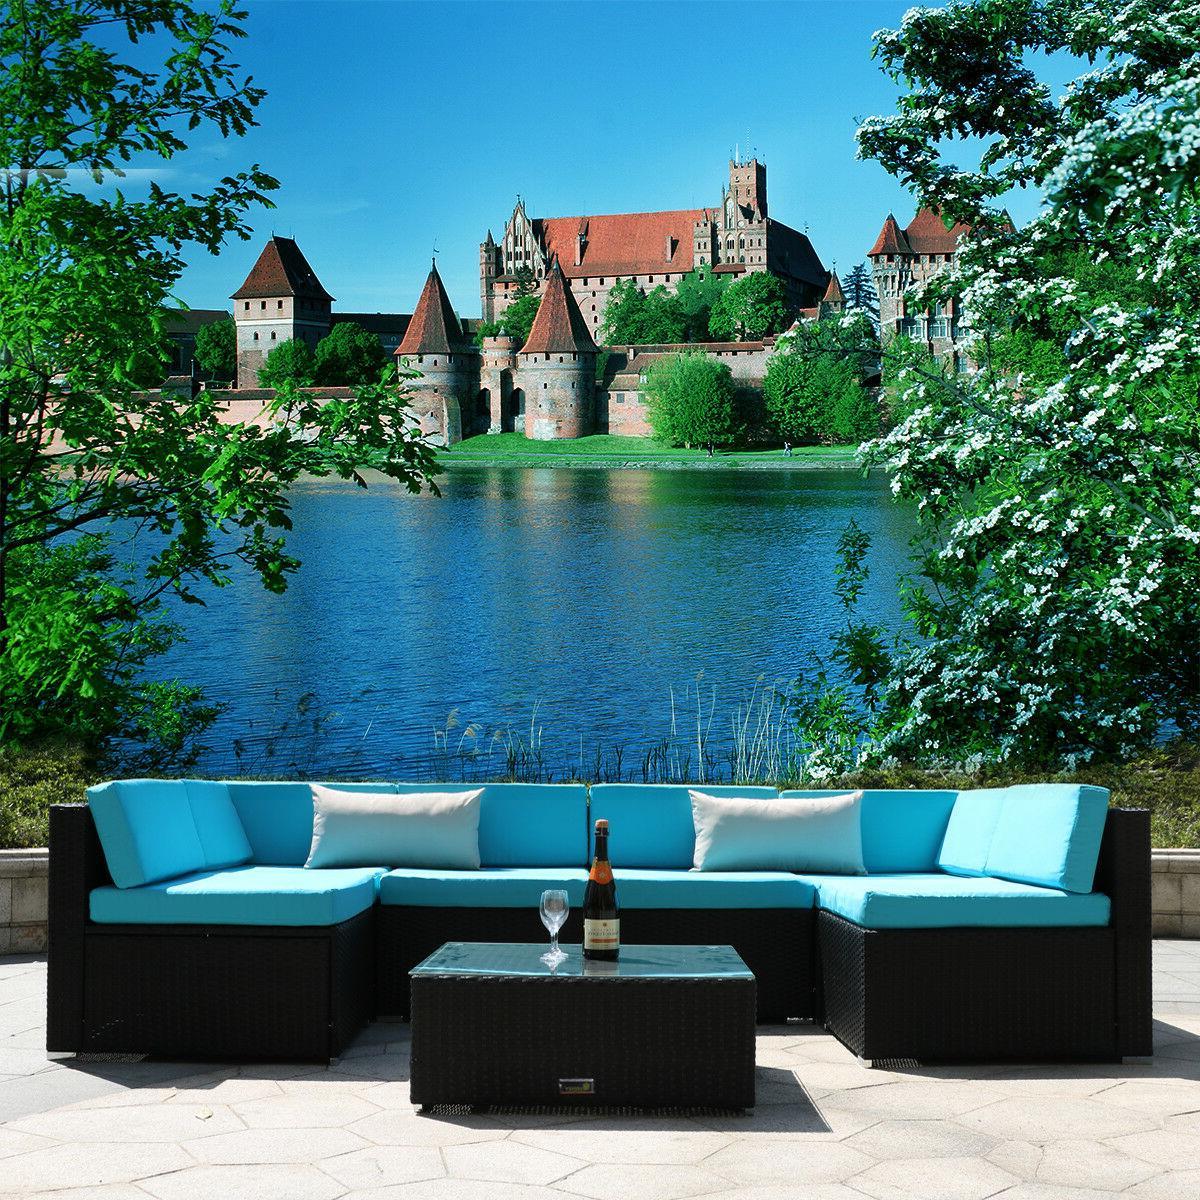 7PC Patio Wicker Furniture Sofa Garden Rattan Set Sectional